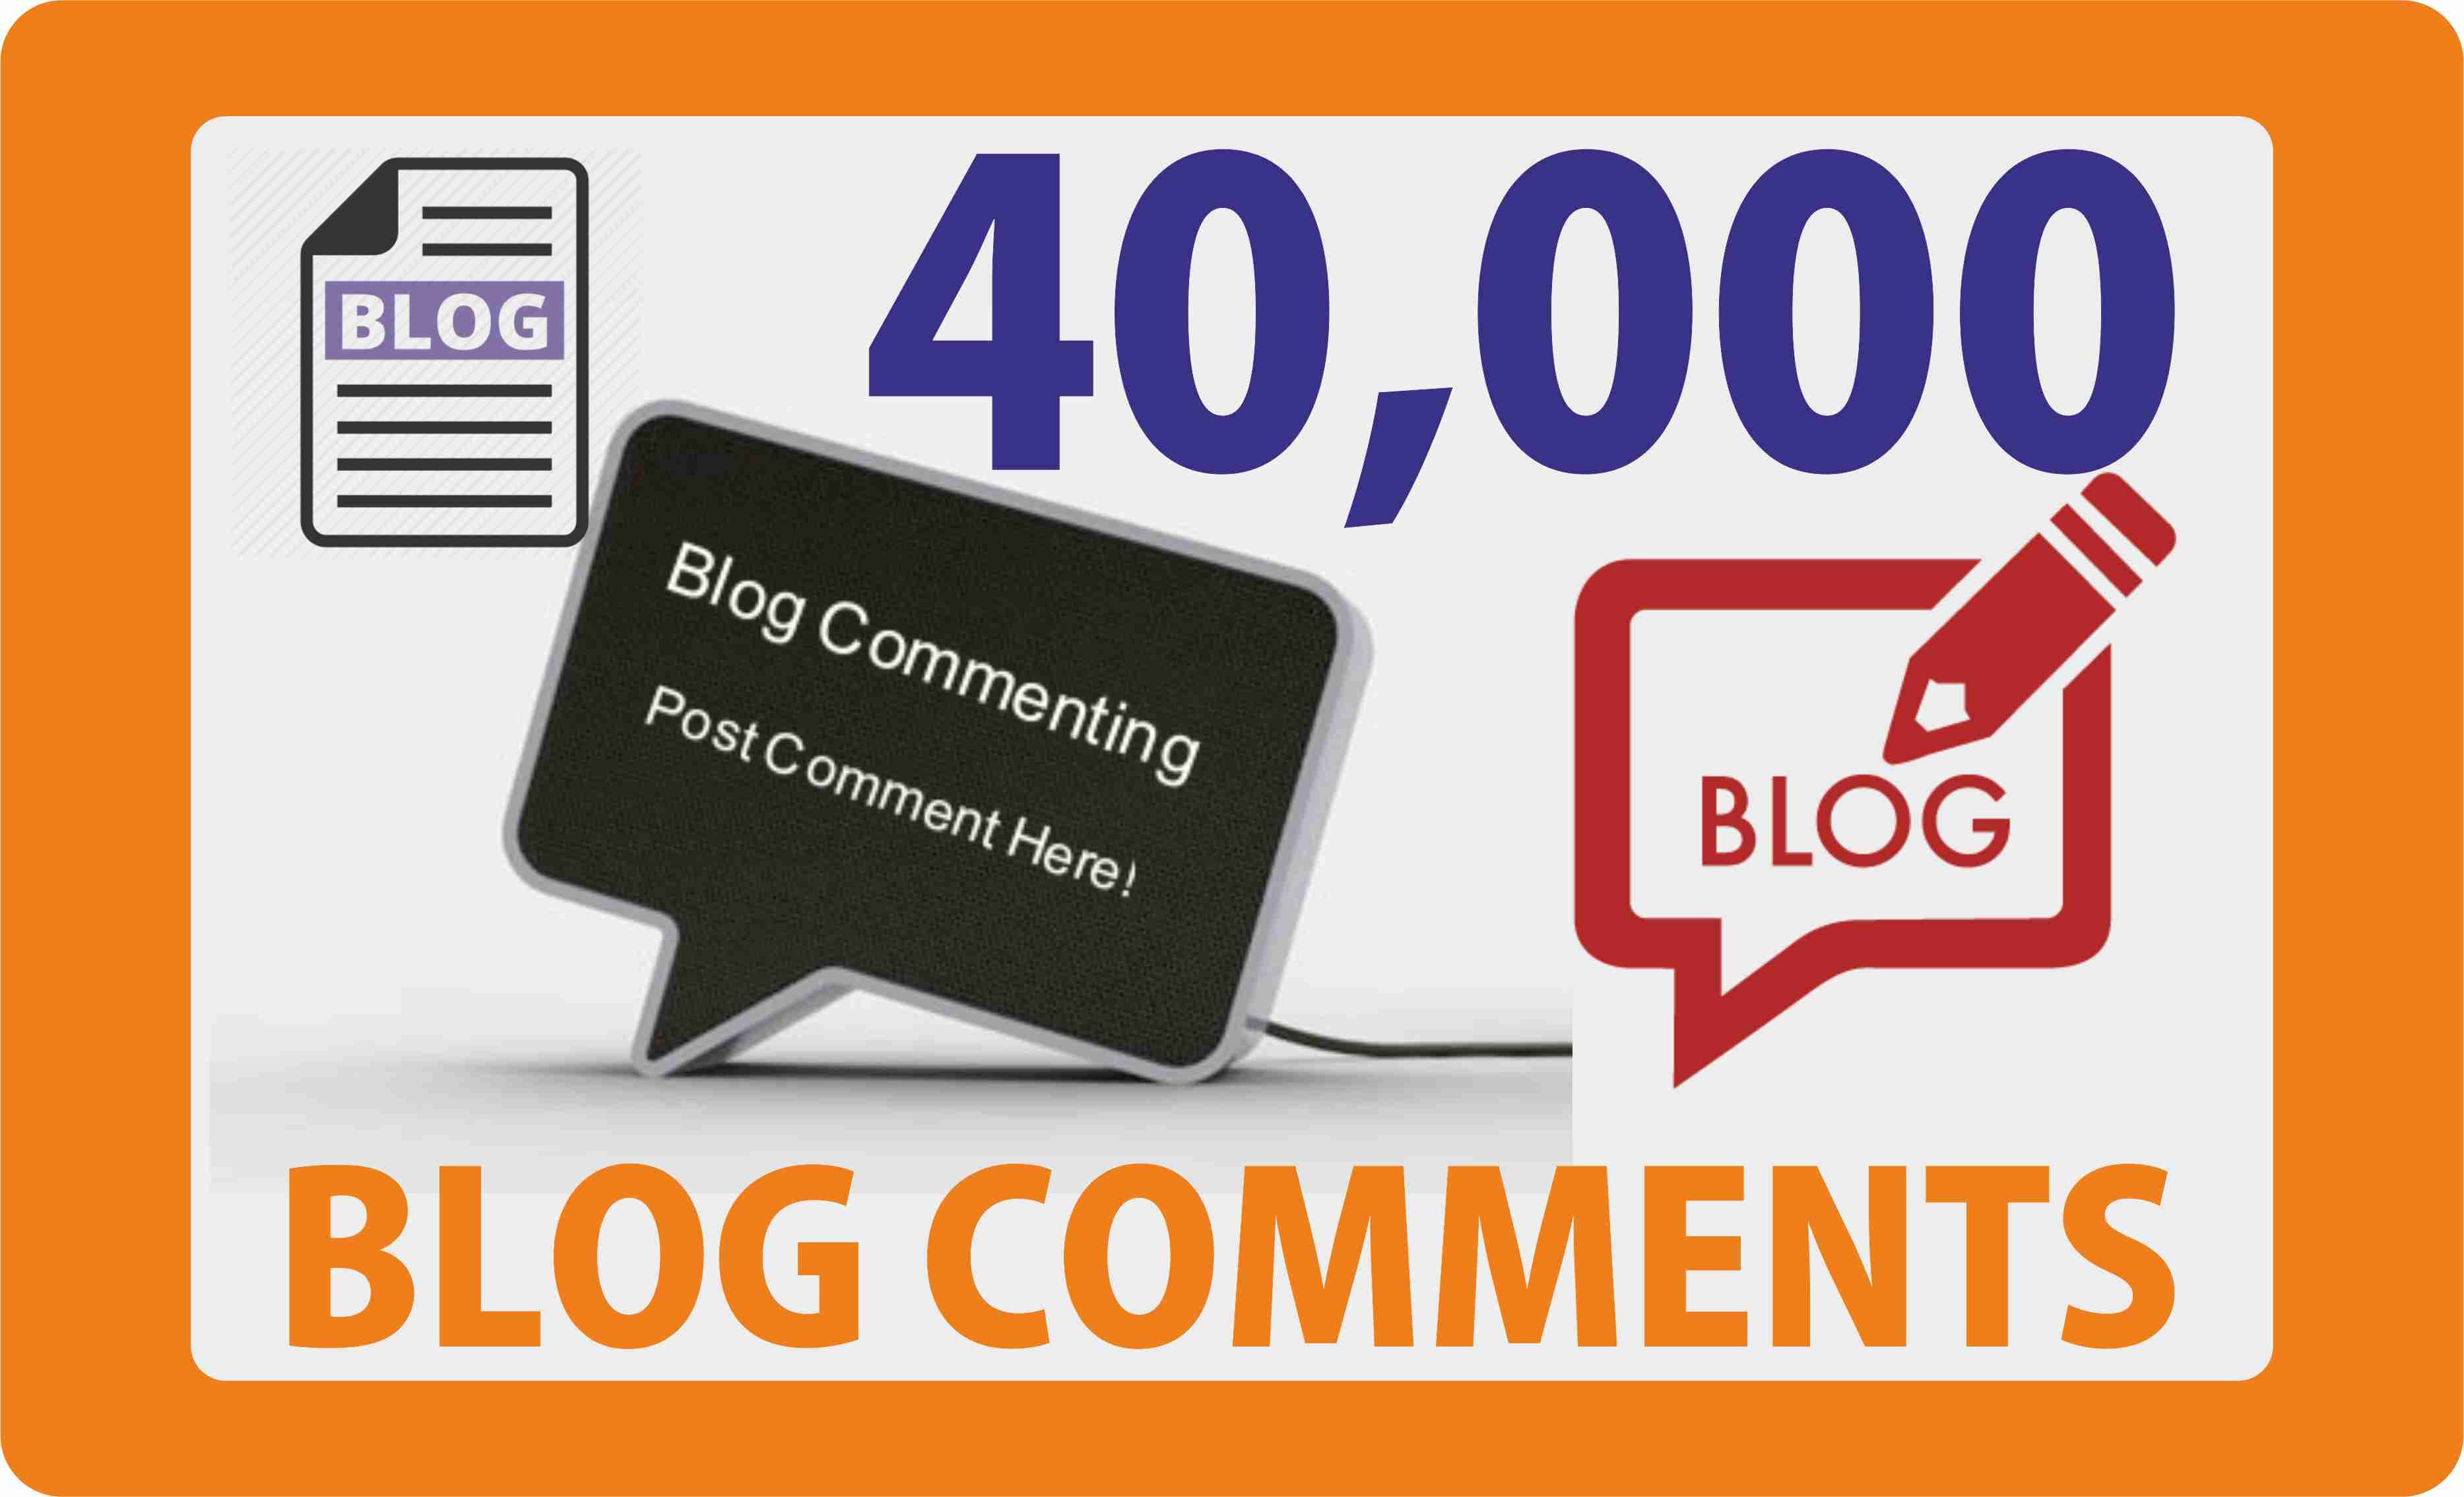 Do 40,000 Blog Comments